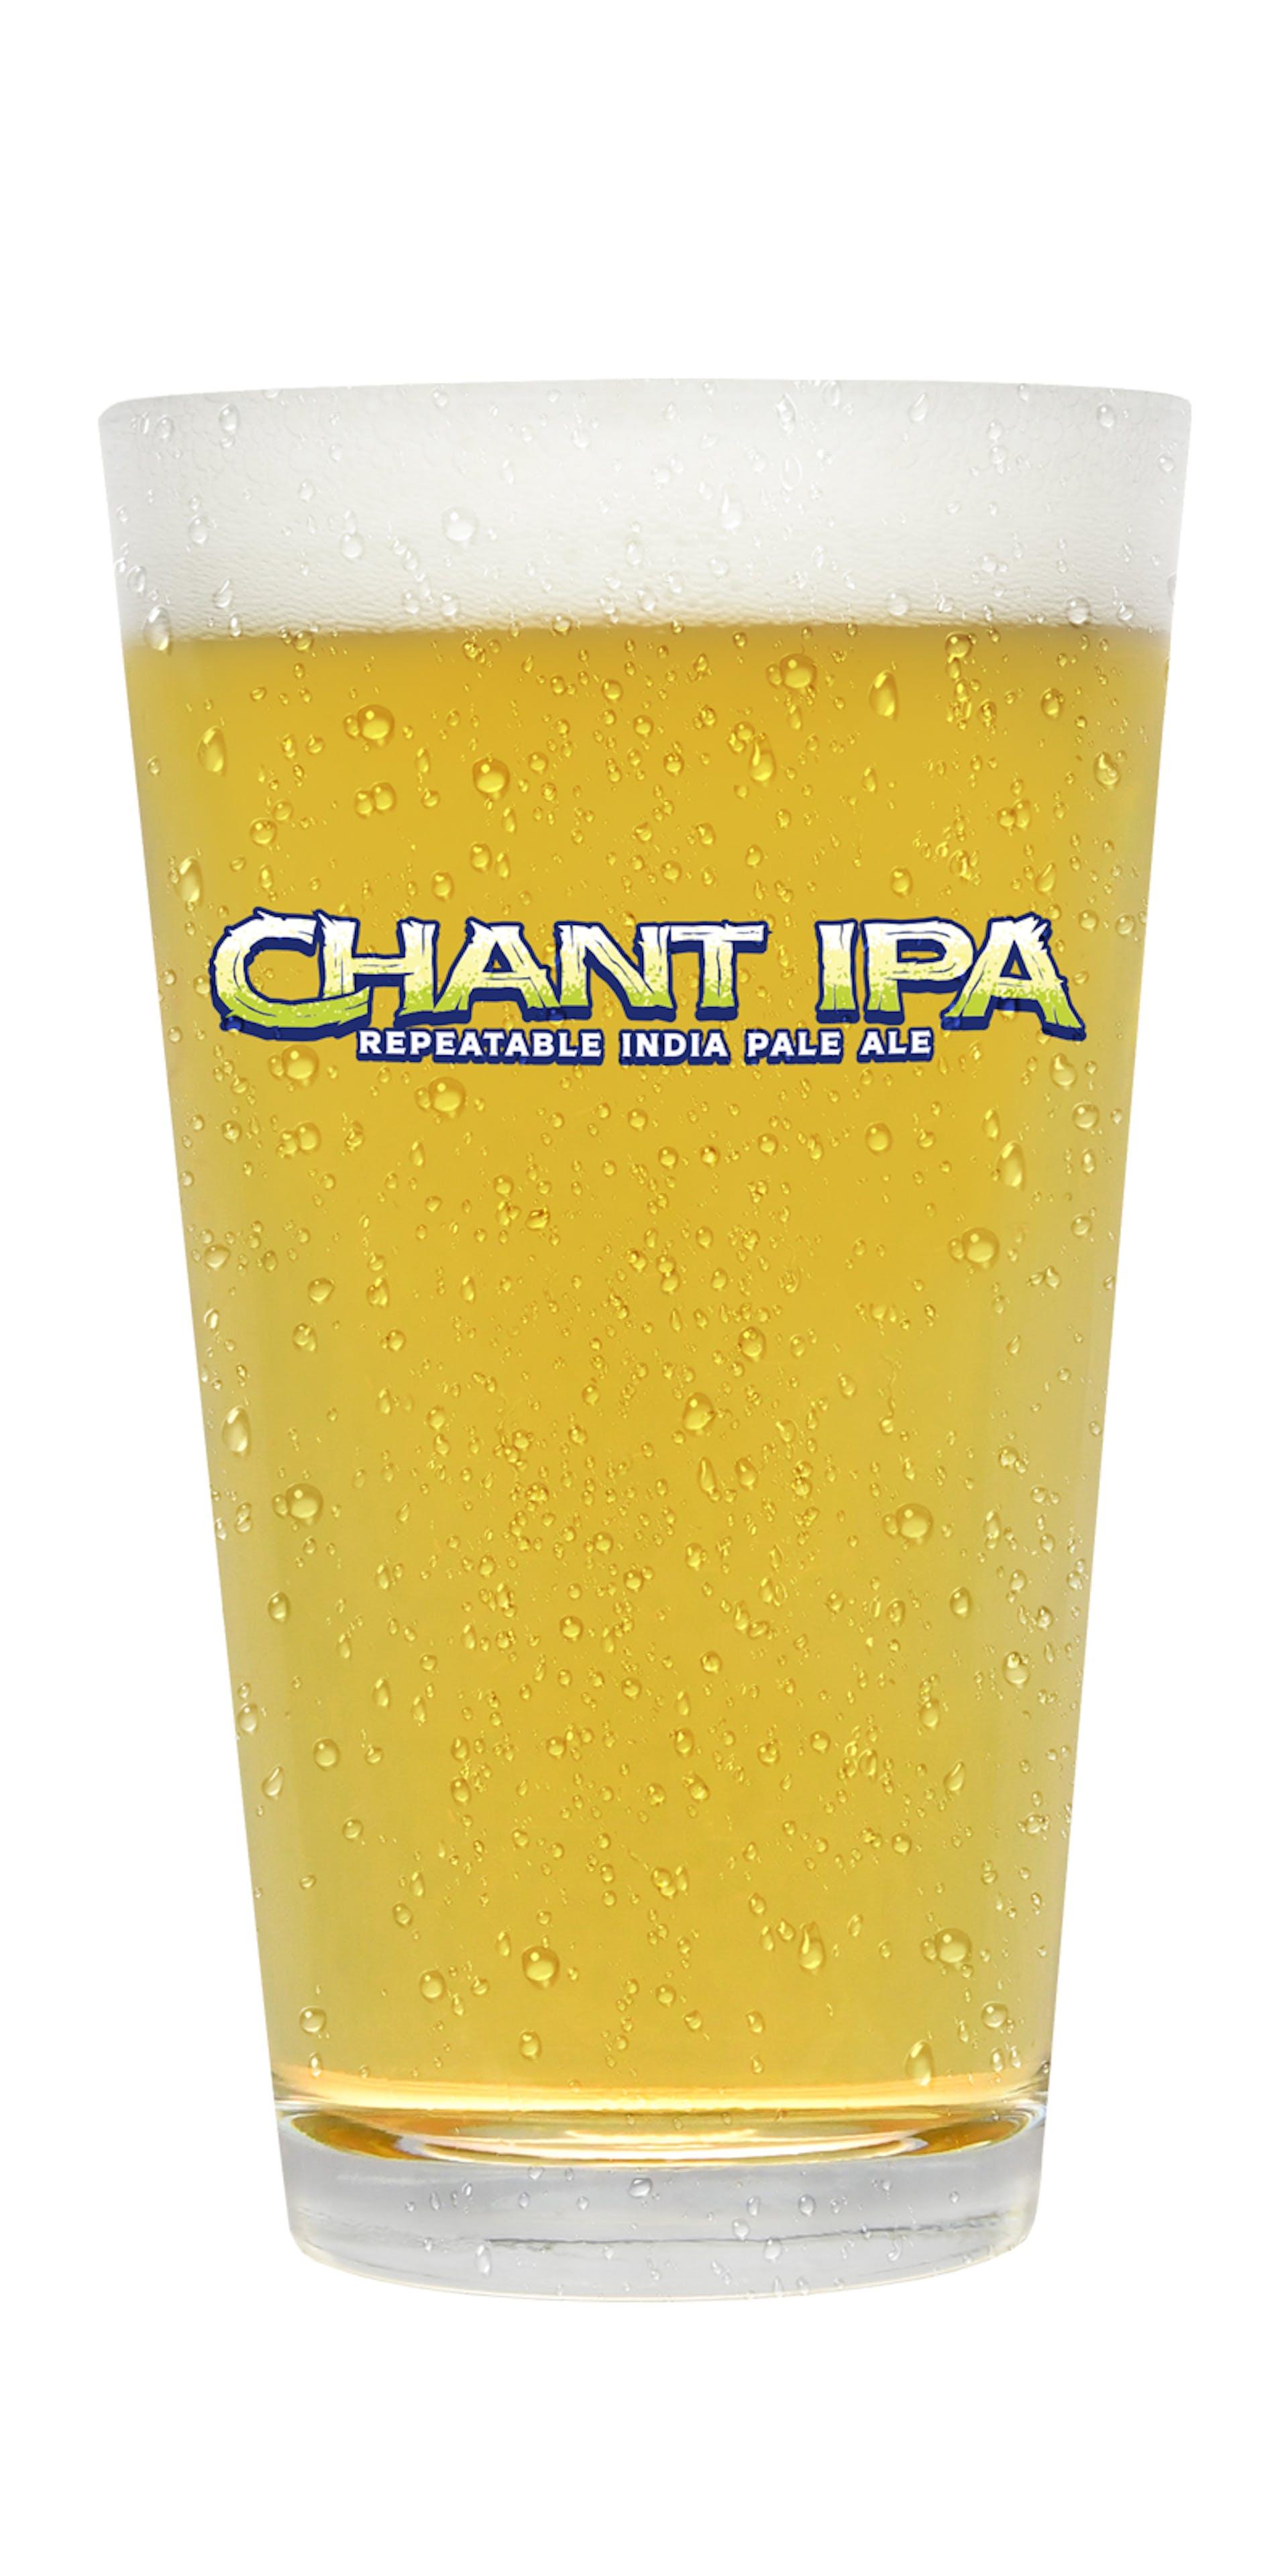 Chant IPA glass